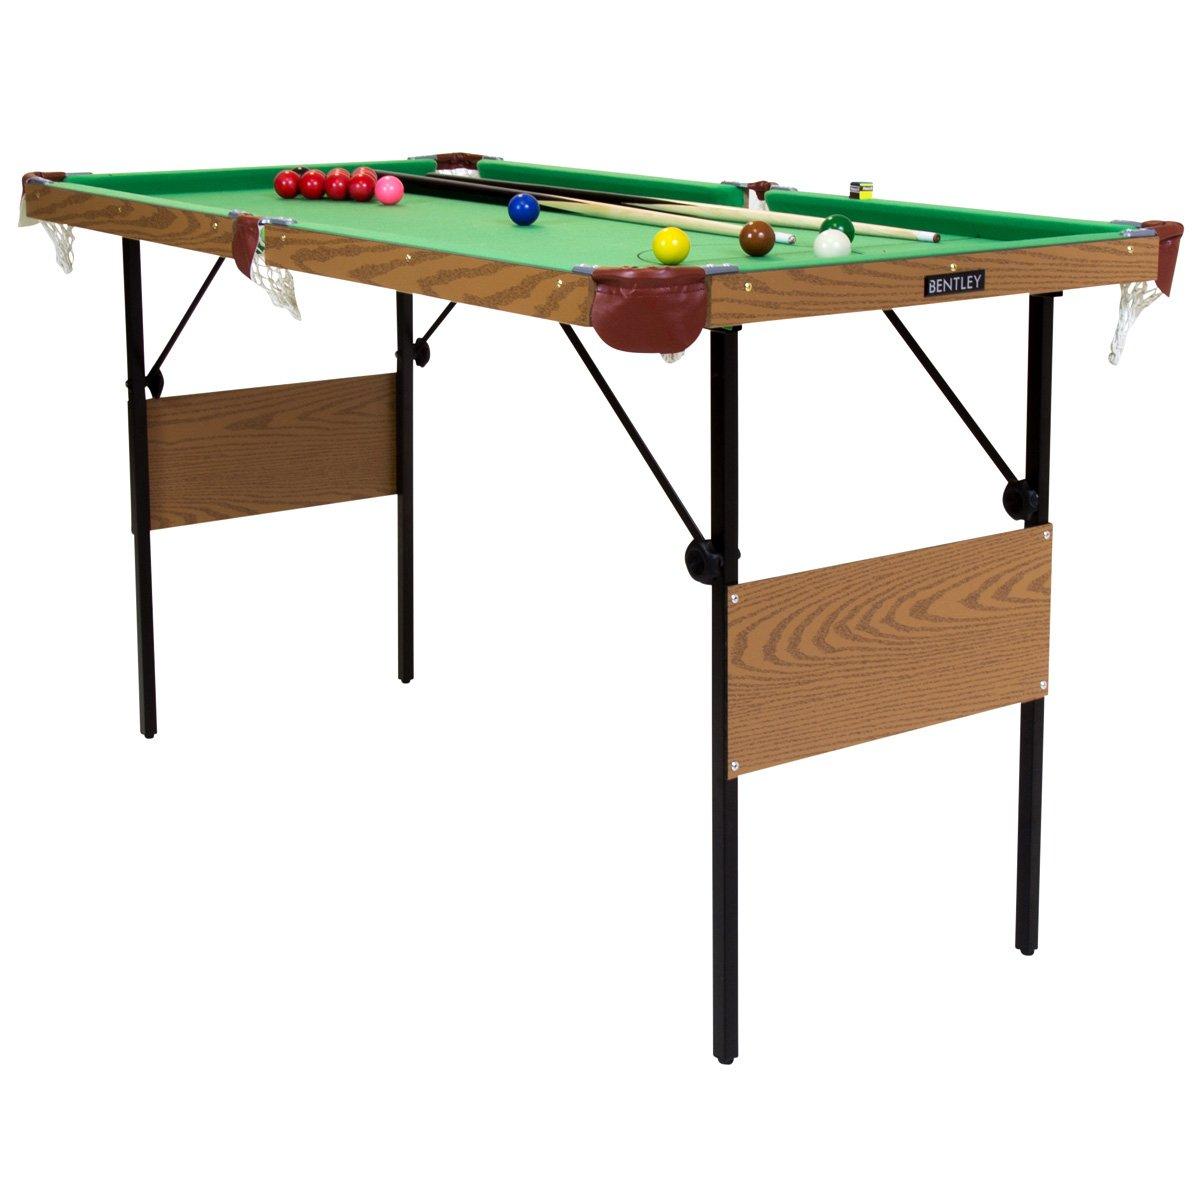 Snooker-Billardtisch - Snookerkugeln & gelbe Poolbillard-Kugeln - 1,39 m Charles Bentley